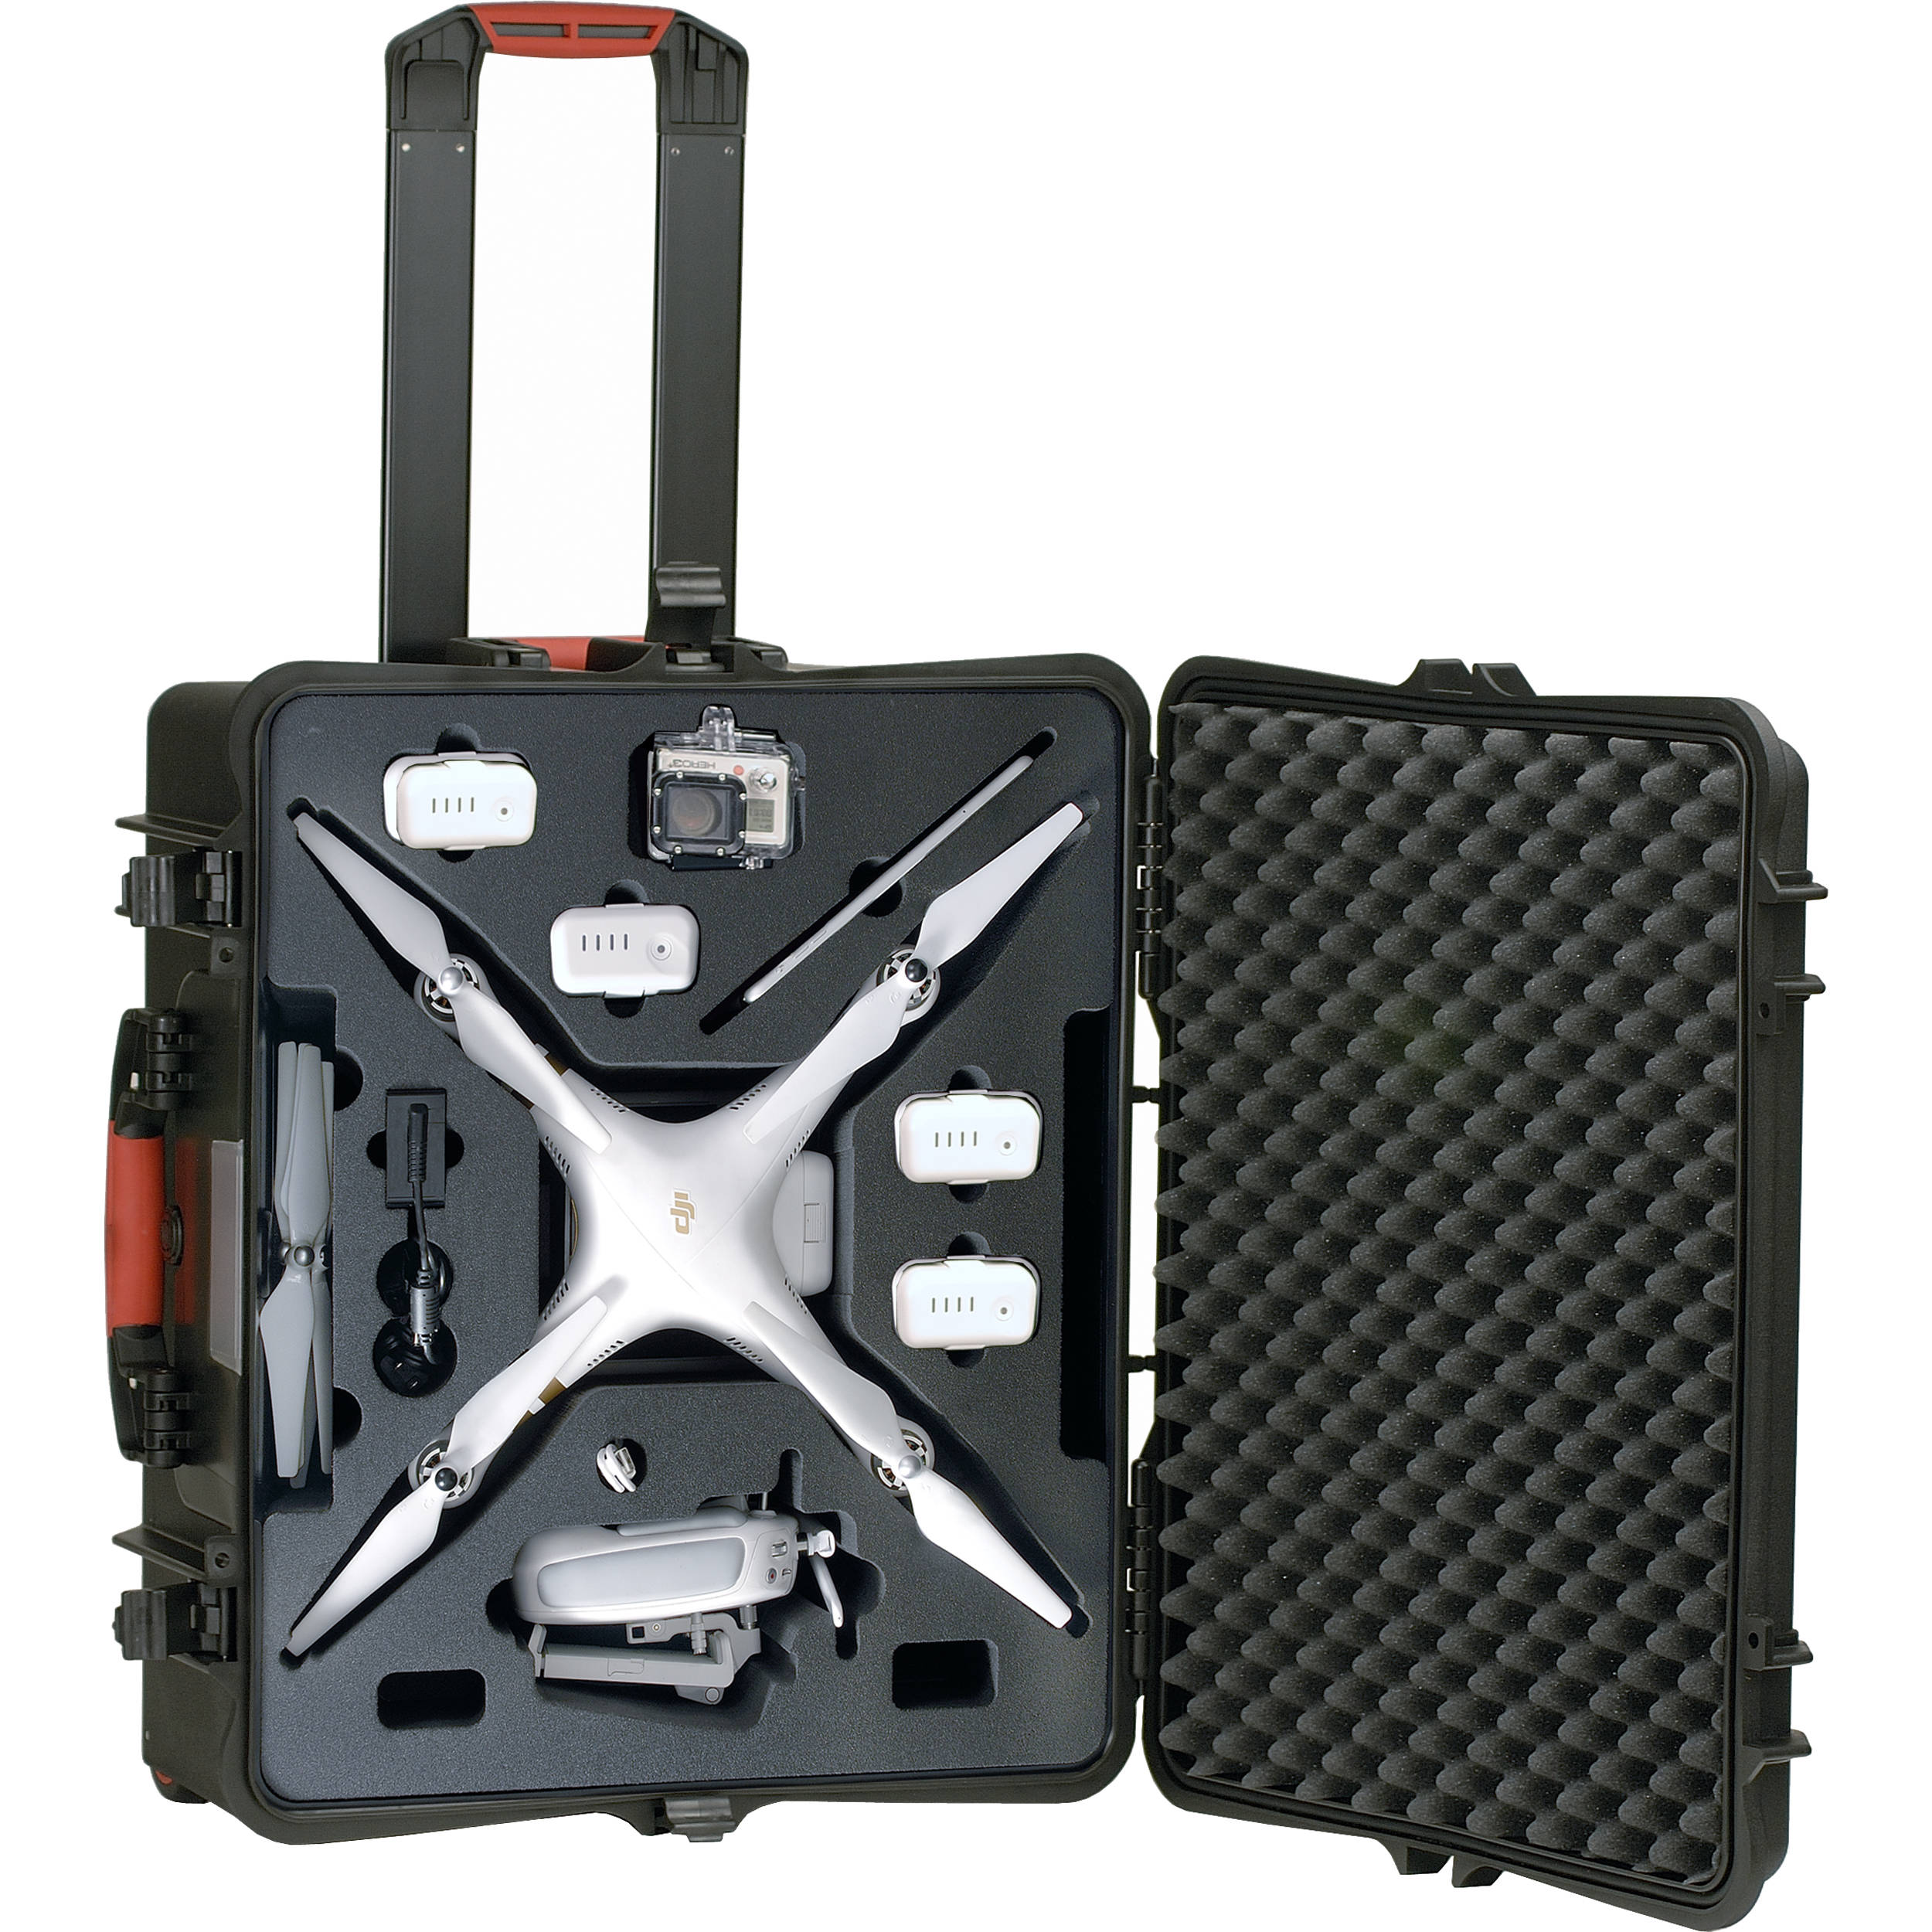 4K Phantom 4 Advanced SE Phantom 4 Pro Drones HUL Premium Aluminium Carrying Case for DJI Phantom 3 Standard Professional